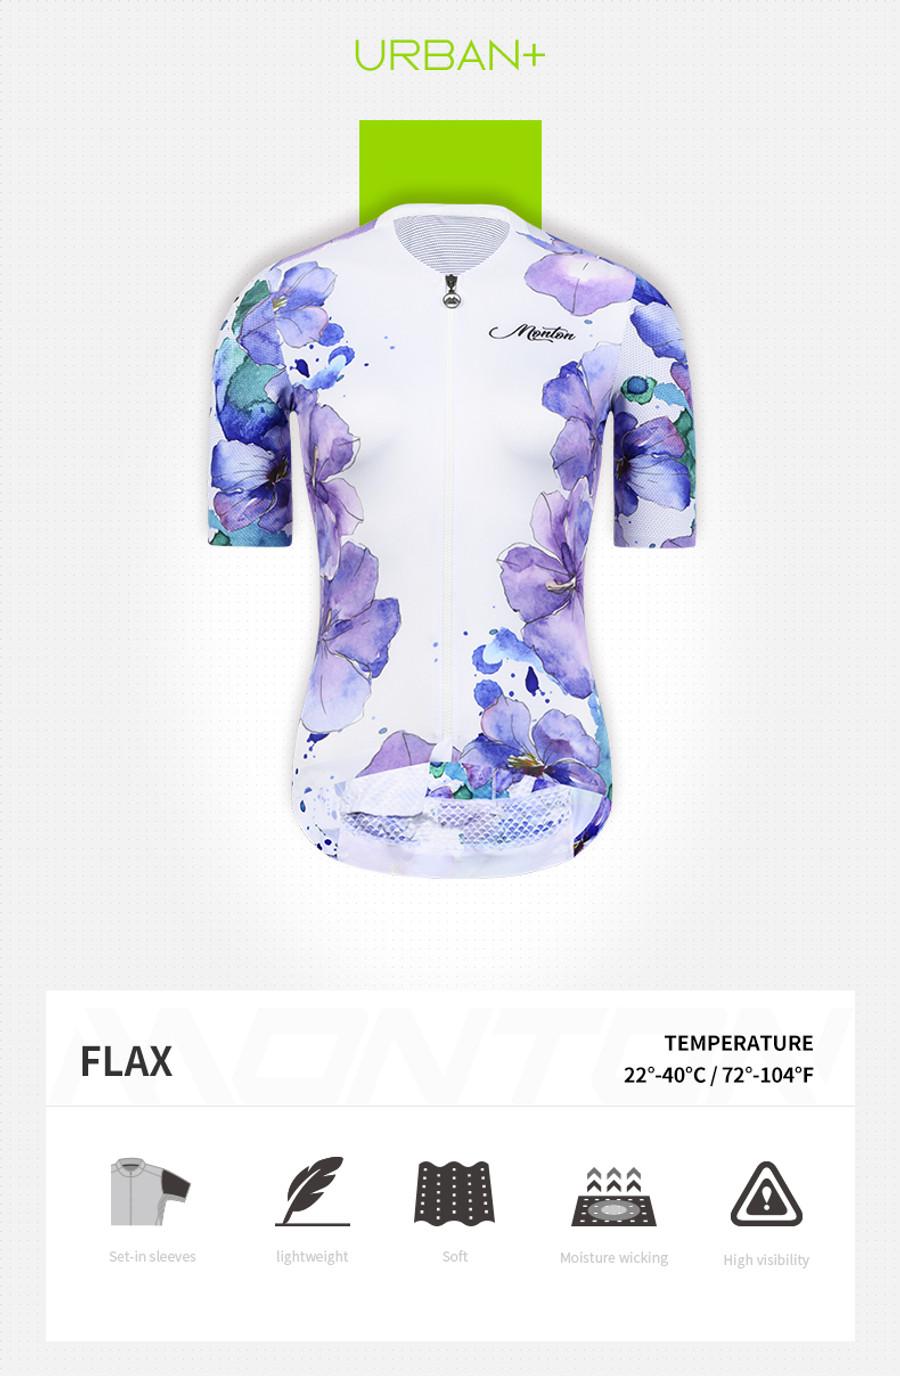 Women's Urban+ Flax Jersey